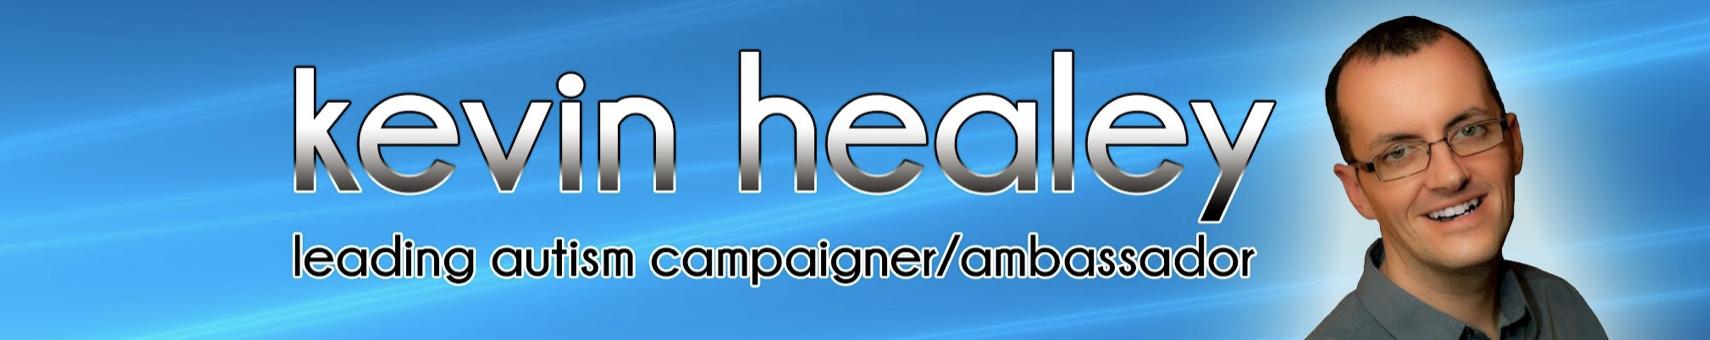 Kevin Healey BCAv Autism Campaigner